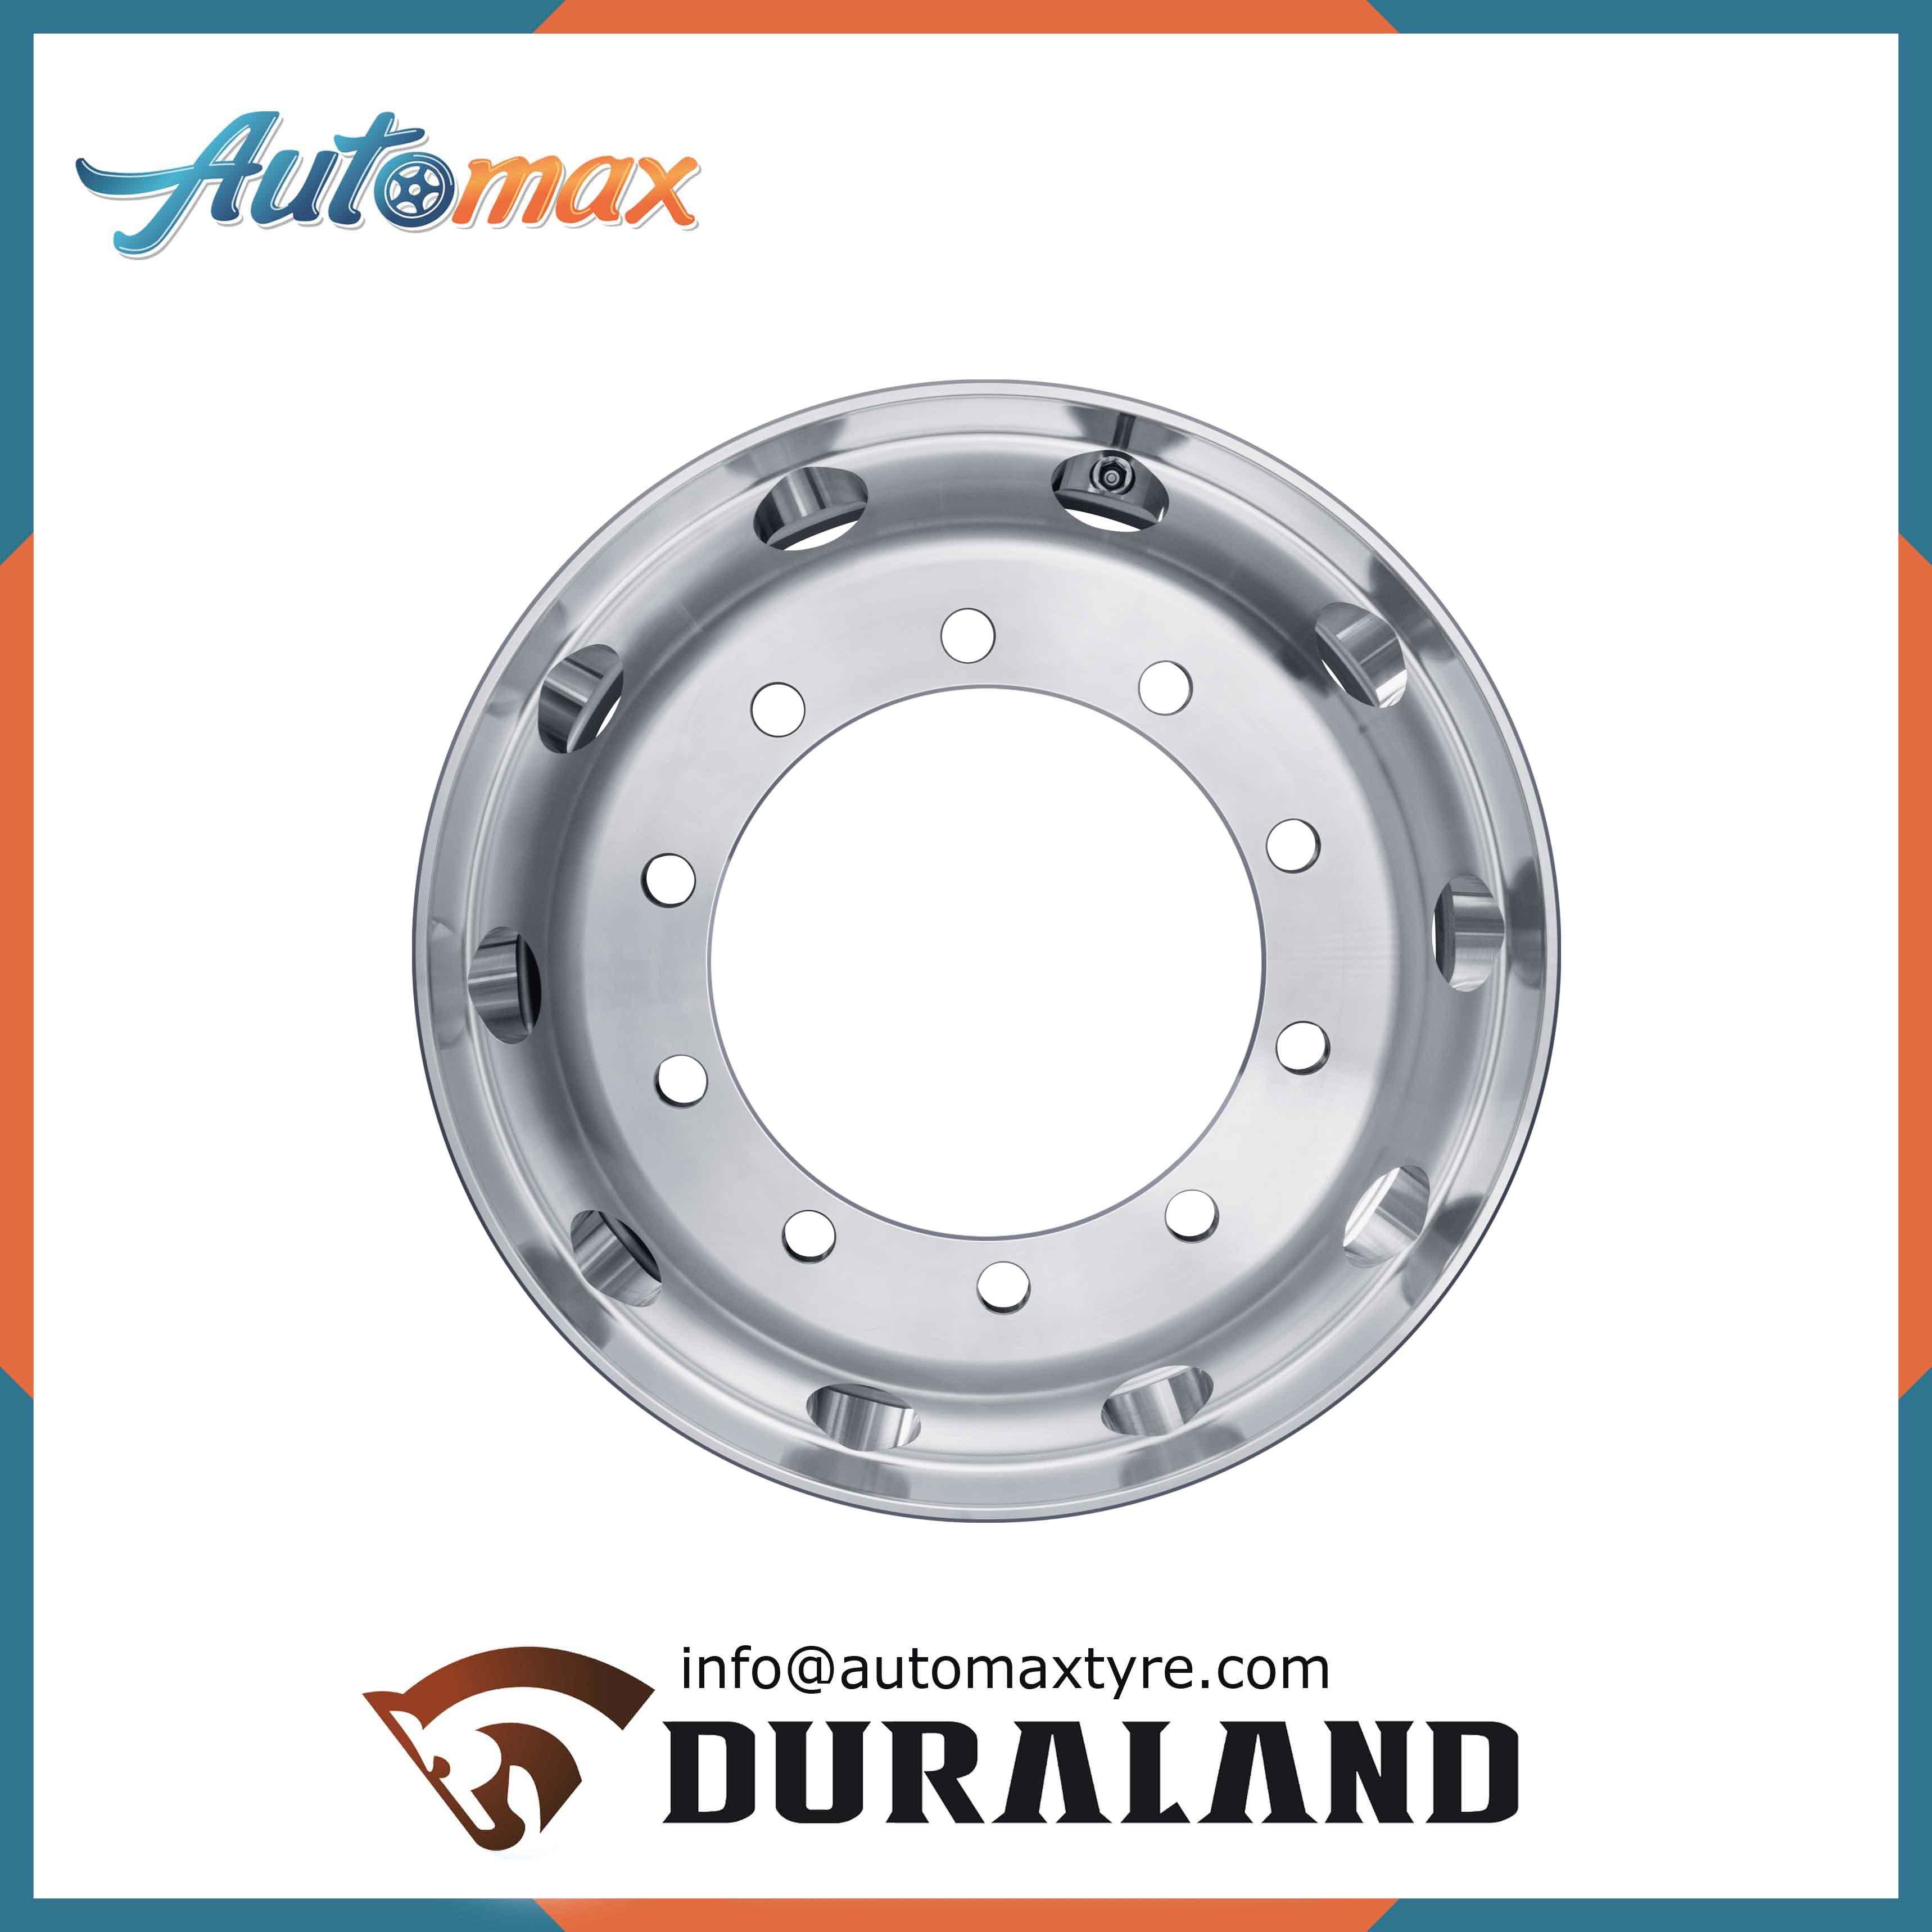 10 Holes Tubeless Steel Wheel (22.5X8.25, 22.5X9.00, 22.5X11.75)